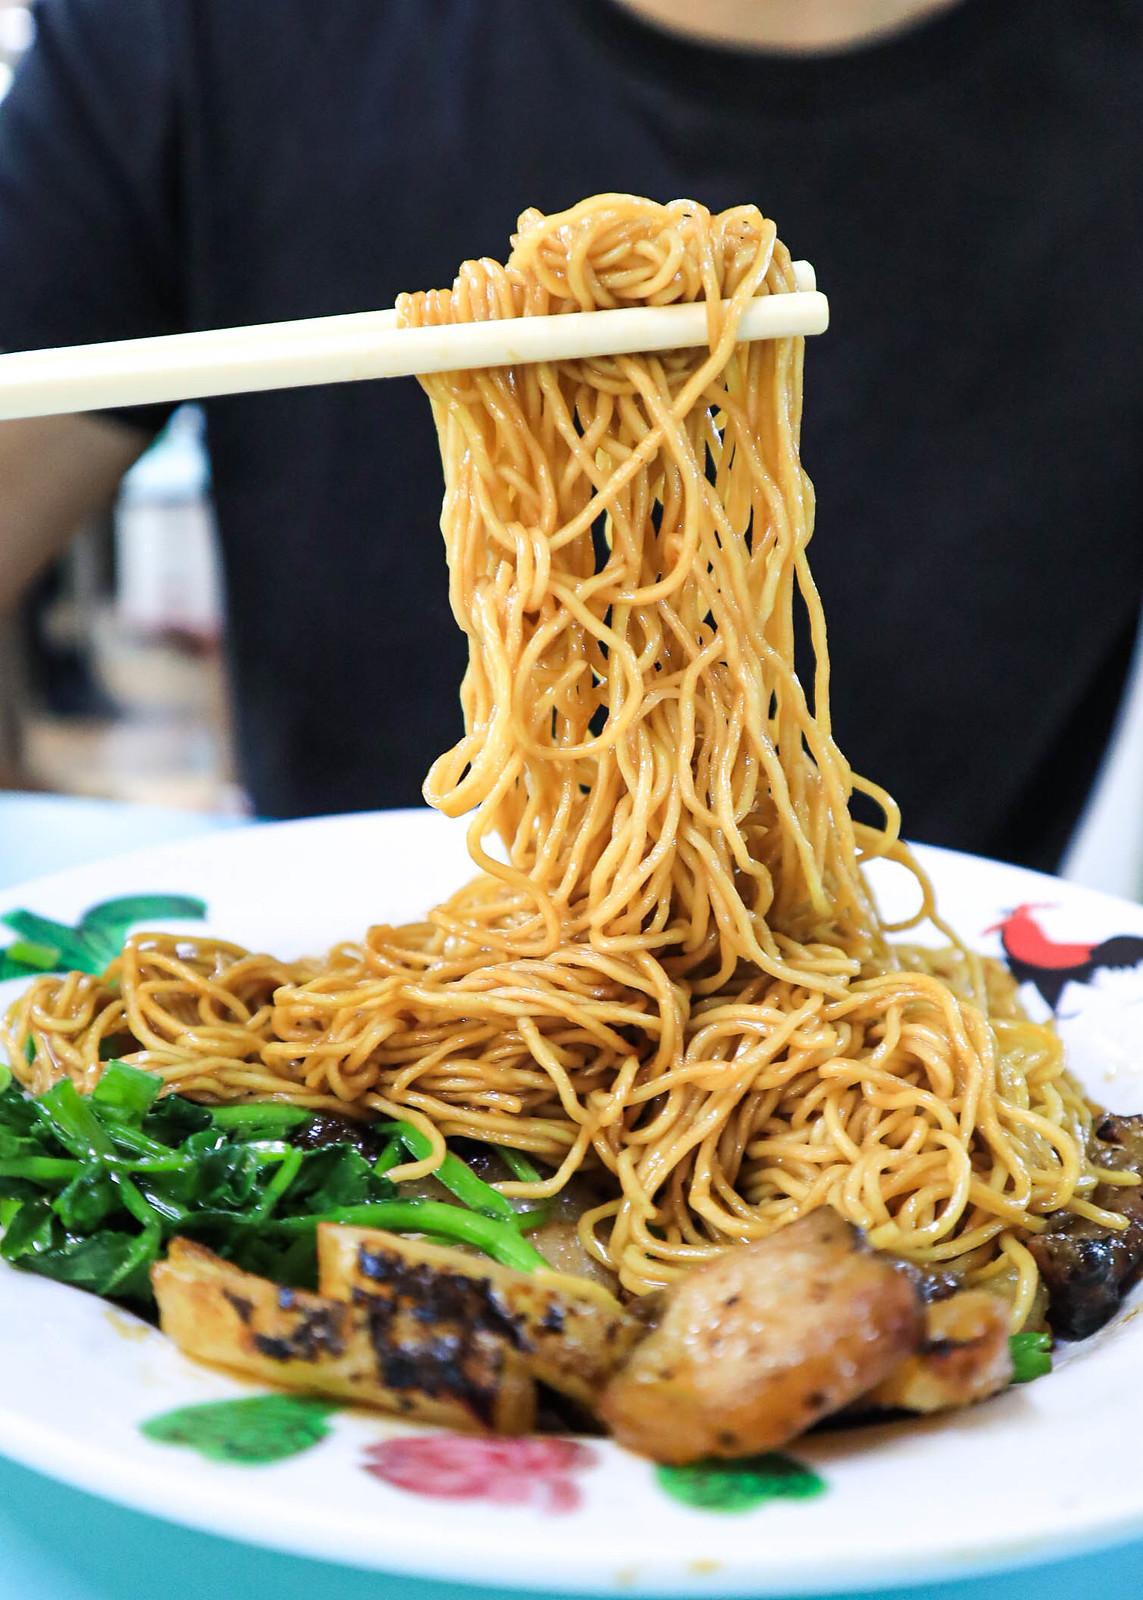 belly-lucky-noodle noodles handshot